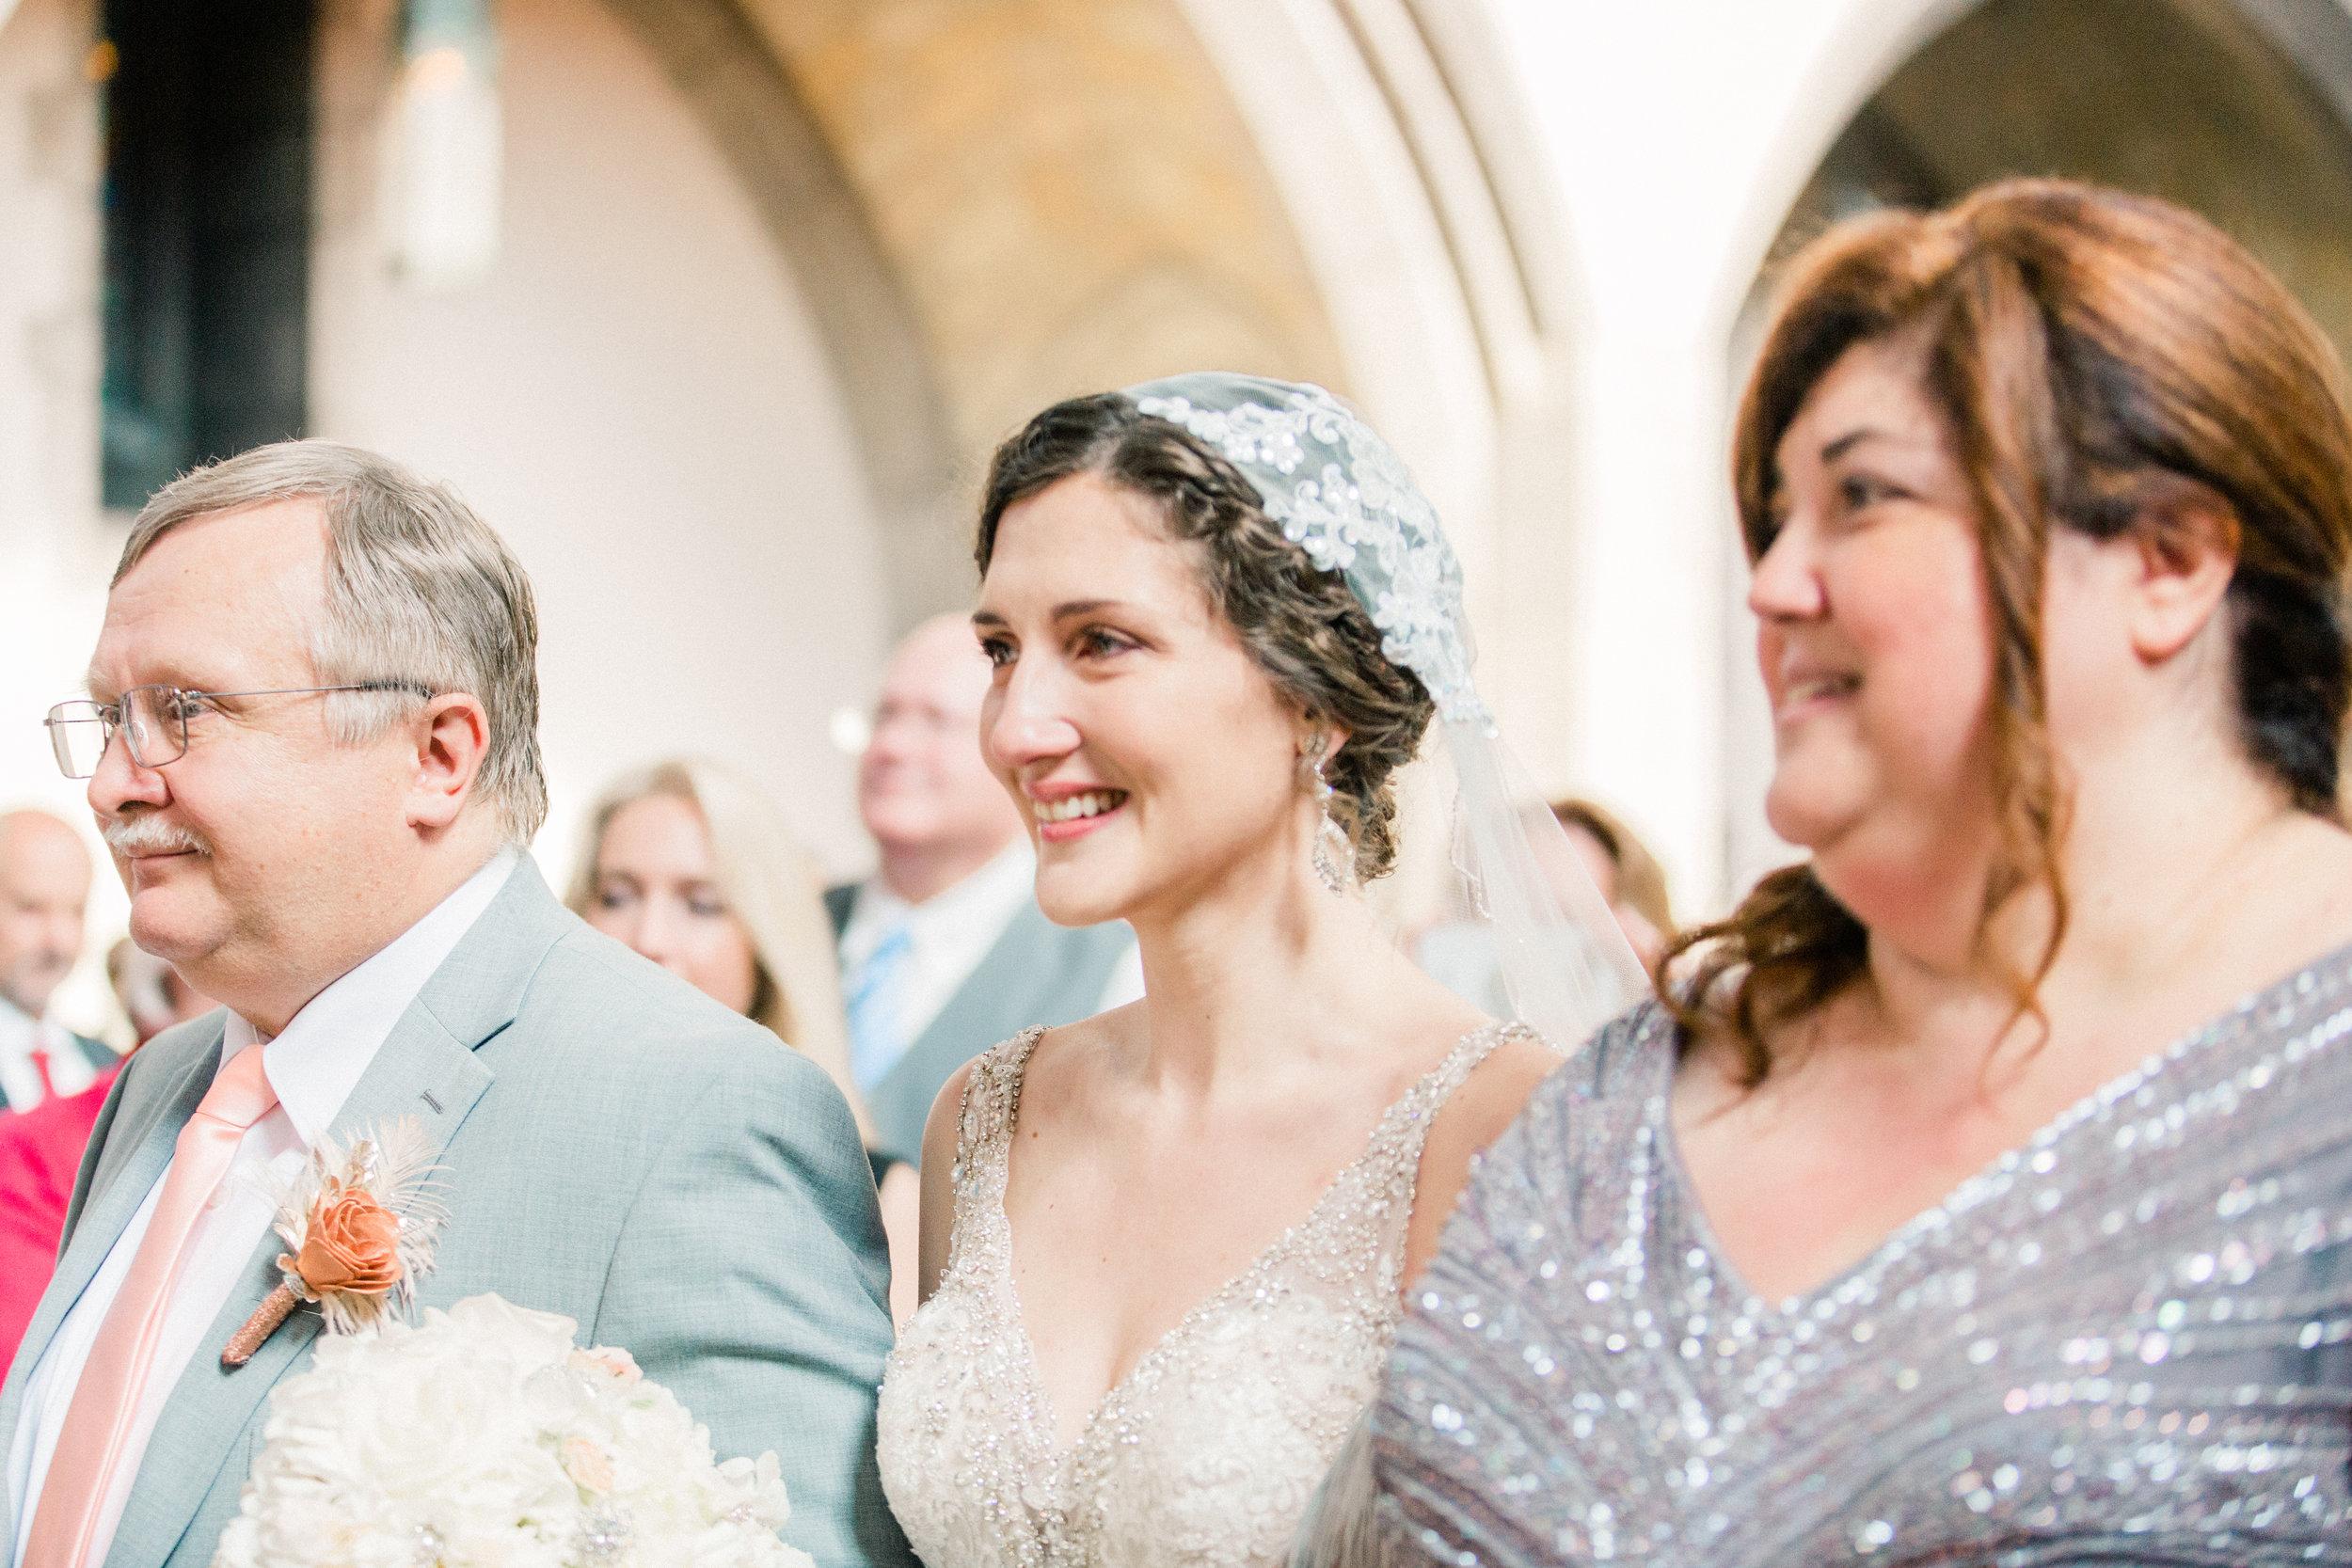 Dorothy_Louise_Photography_University_of_Chicago_Chapel_Wedding-21.jpg